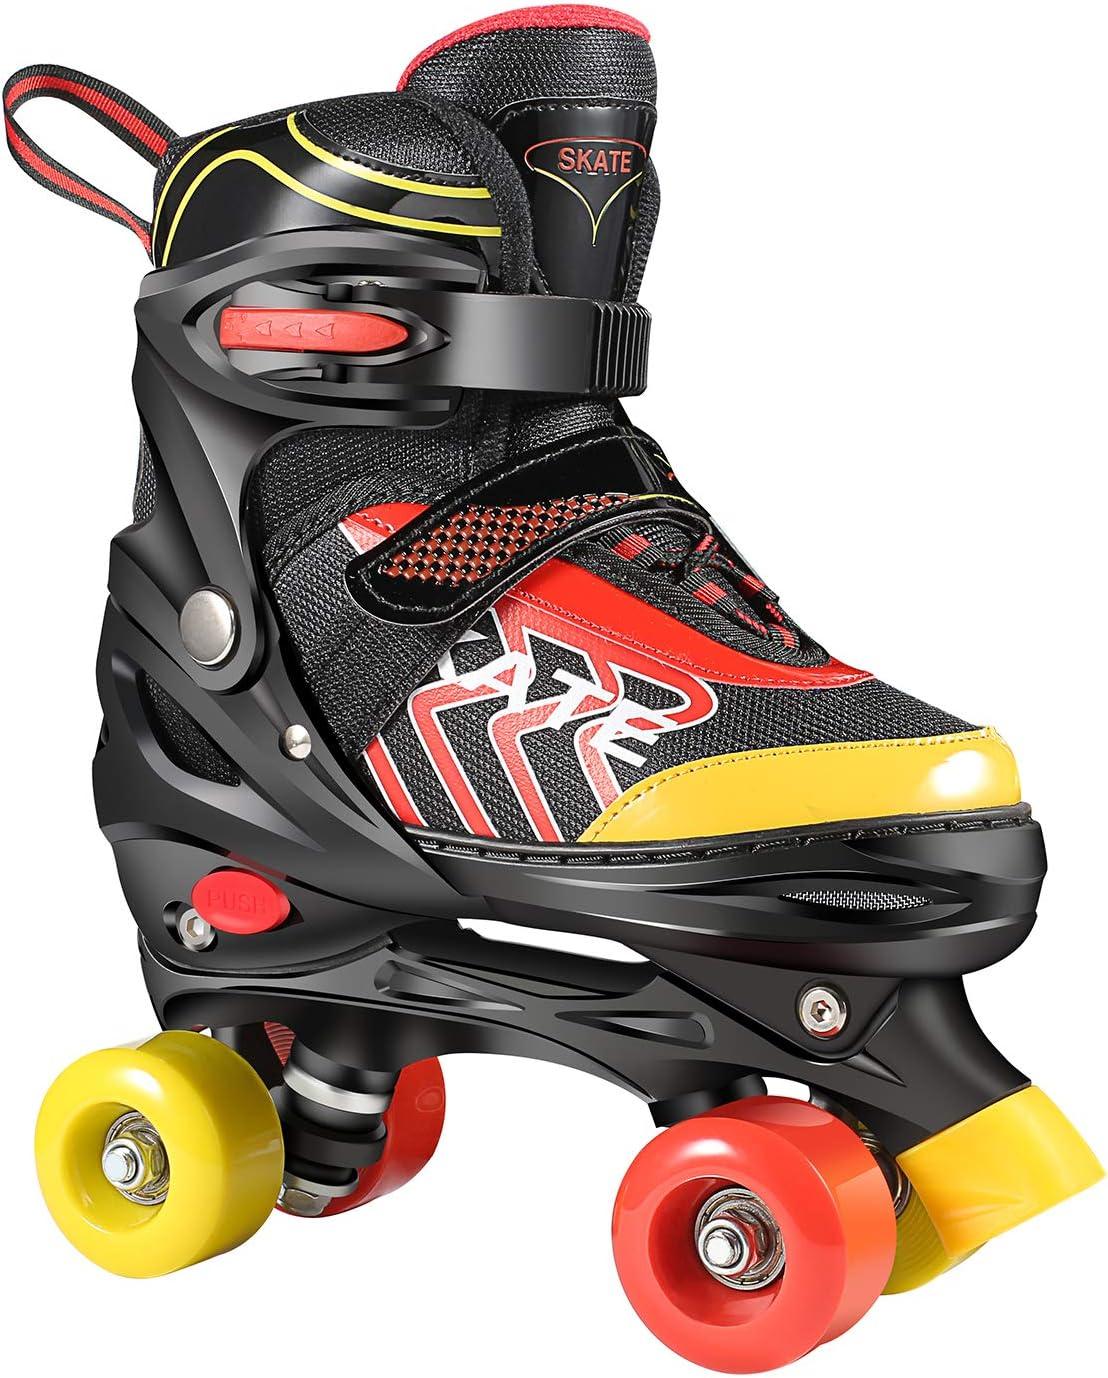 Adjustable Roller Skates Blade Light Up Flashing Skates Wheels Inline Skates Blades for Toddler Boys Mesh Breathable 3 Size Inline Skates for Beginners Children Boys Girls Hikole Inline Skates